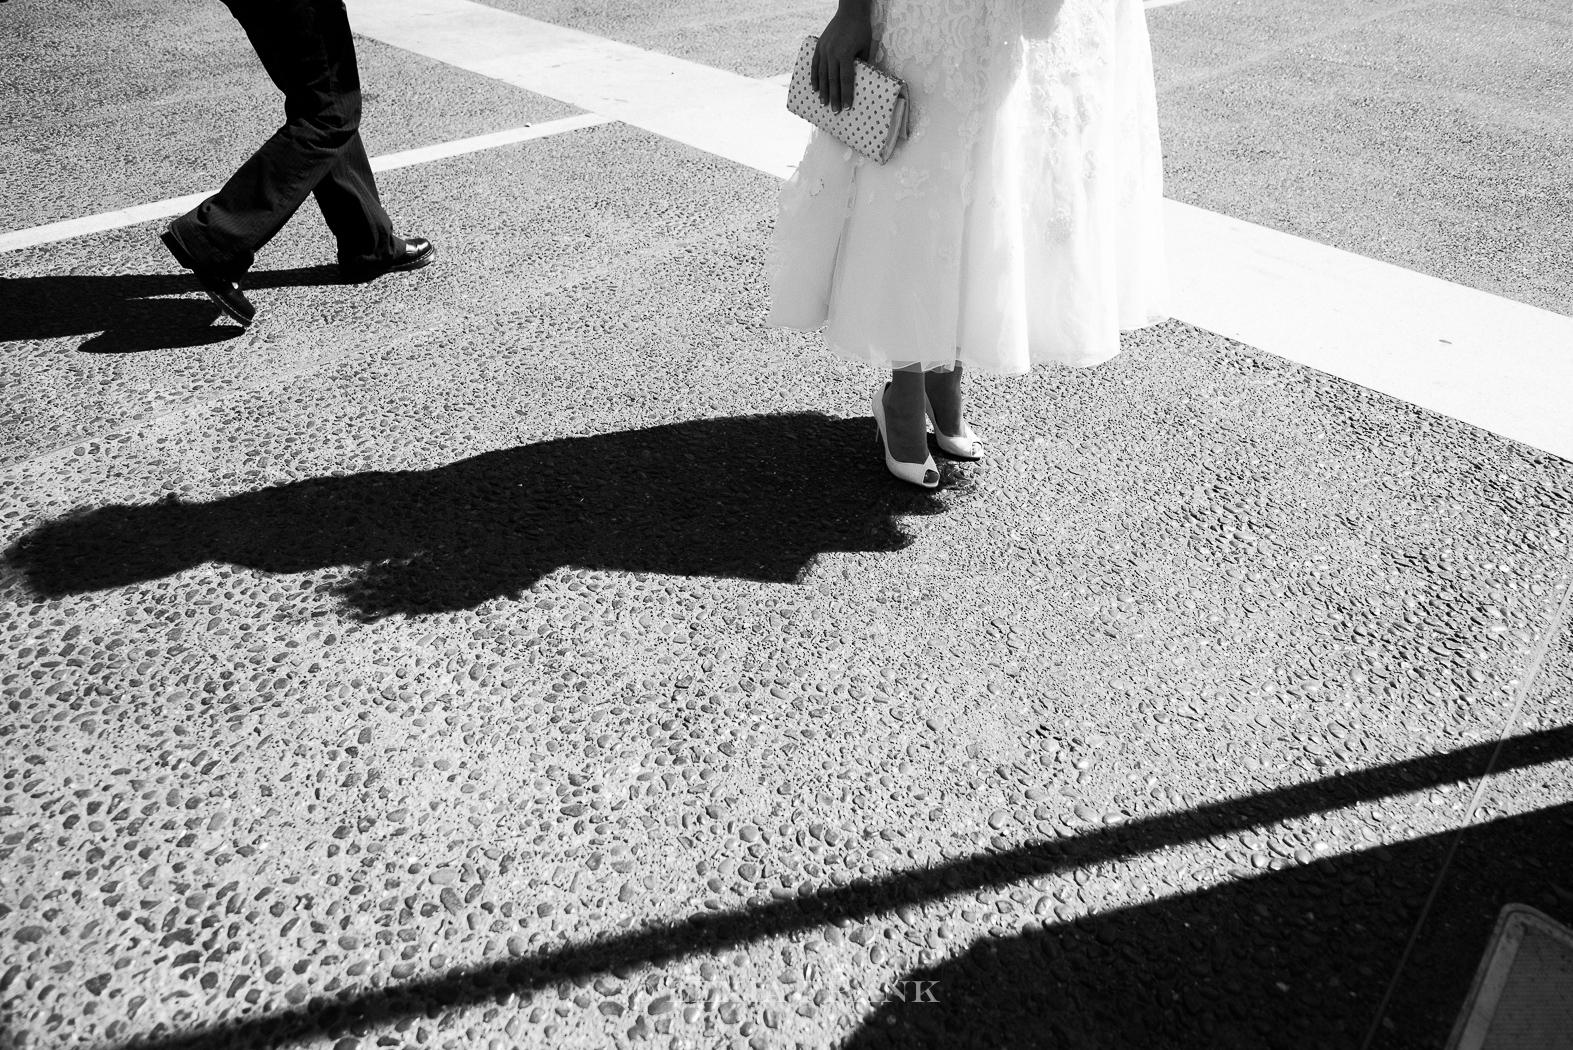 Destination Wedding Photographer Lexia Frank - a portland oregon fine art film photographer - documents this San Francisco City Hall Wedding as bride heads to the courthouse. www.lexiafrank.com